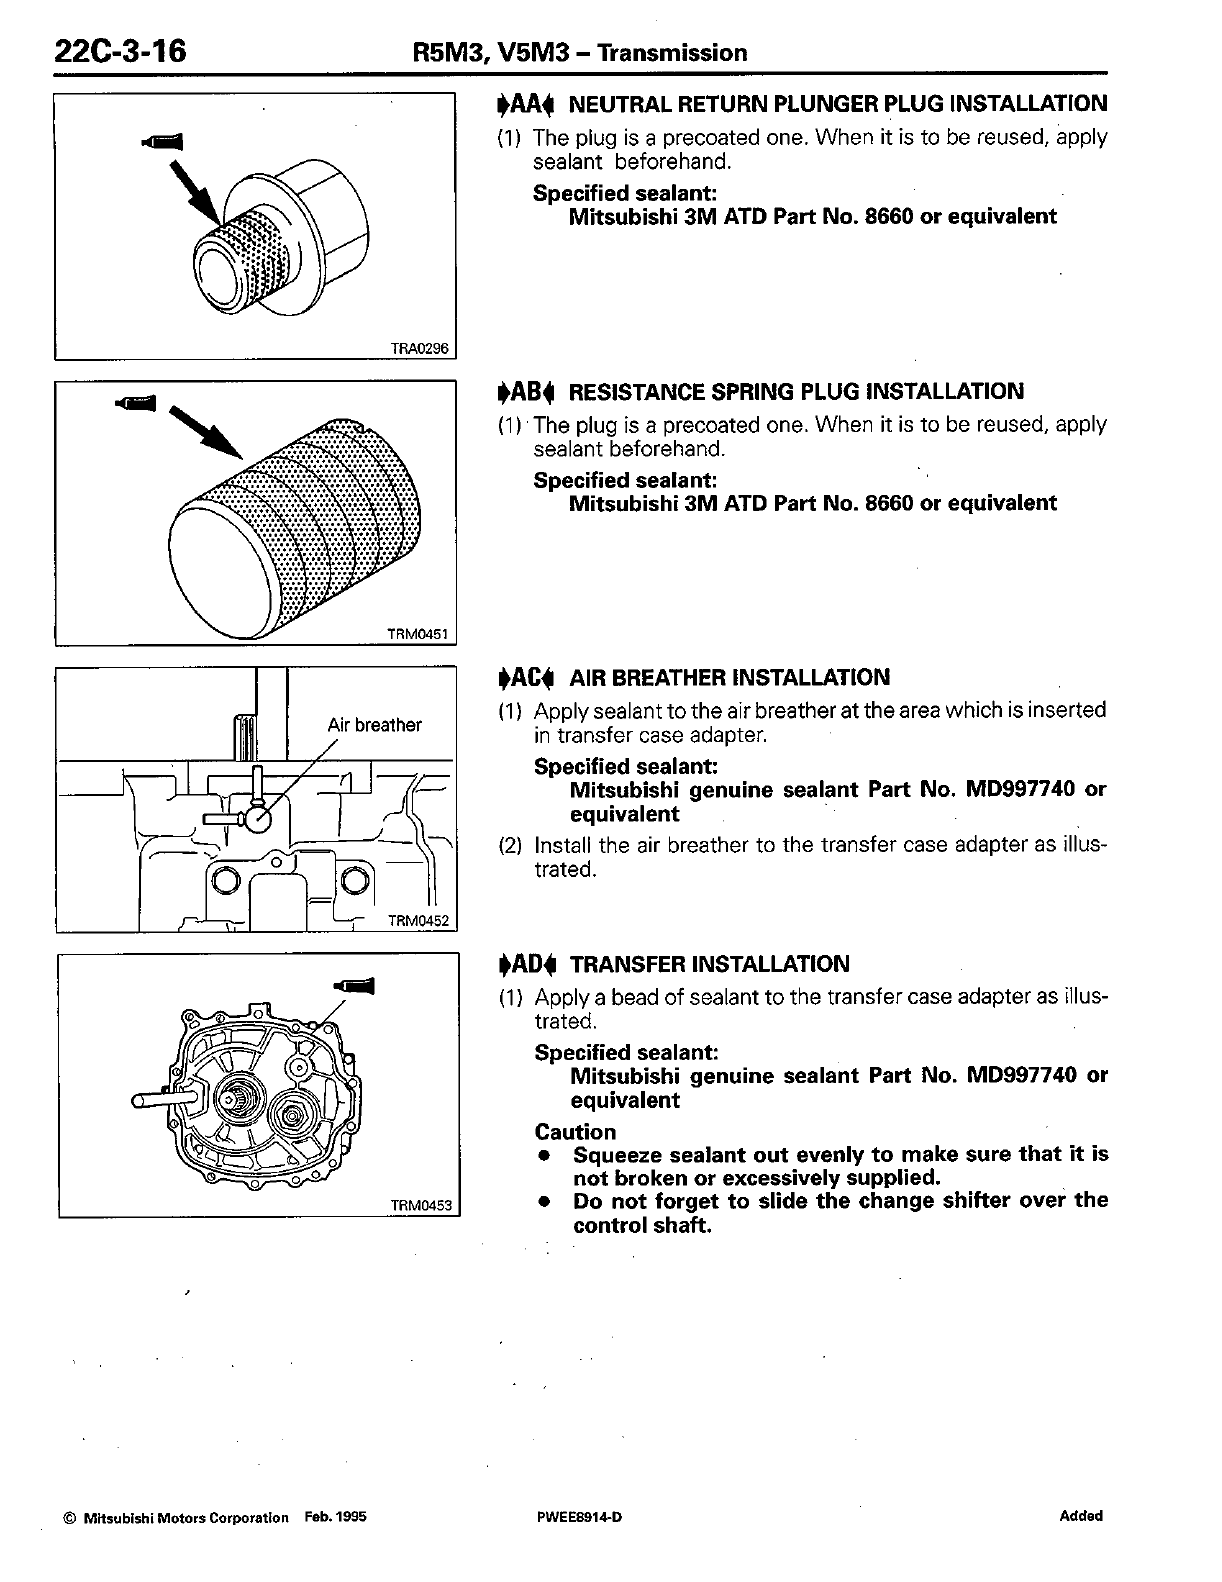 Mitsubishi Motors Automobile R5m3 Users Manual Transmission Workshop Control Notes